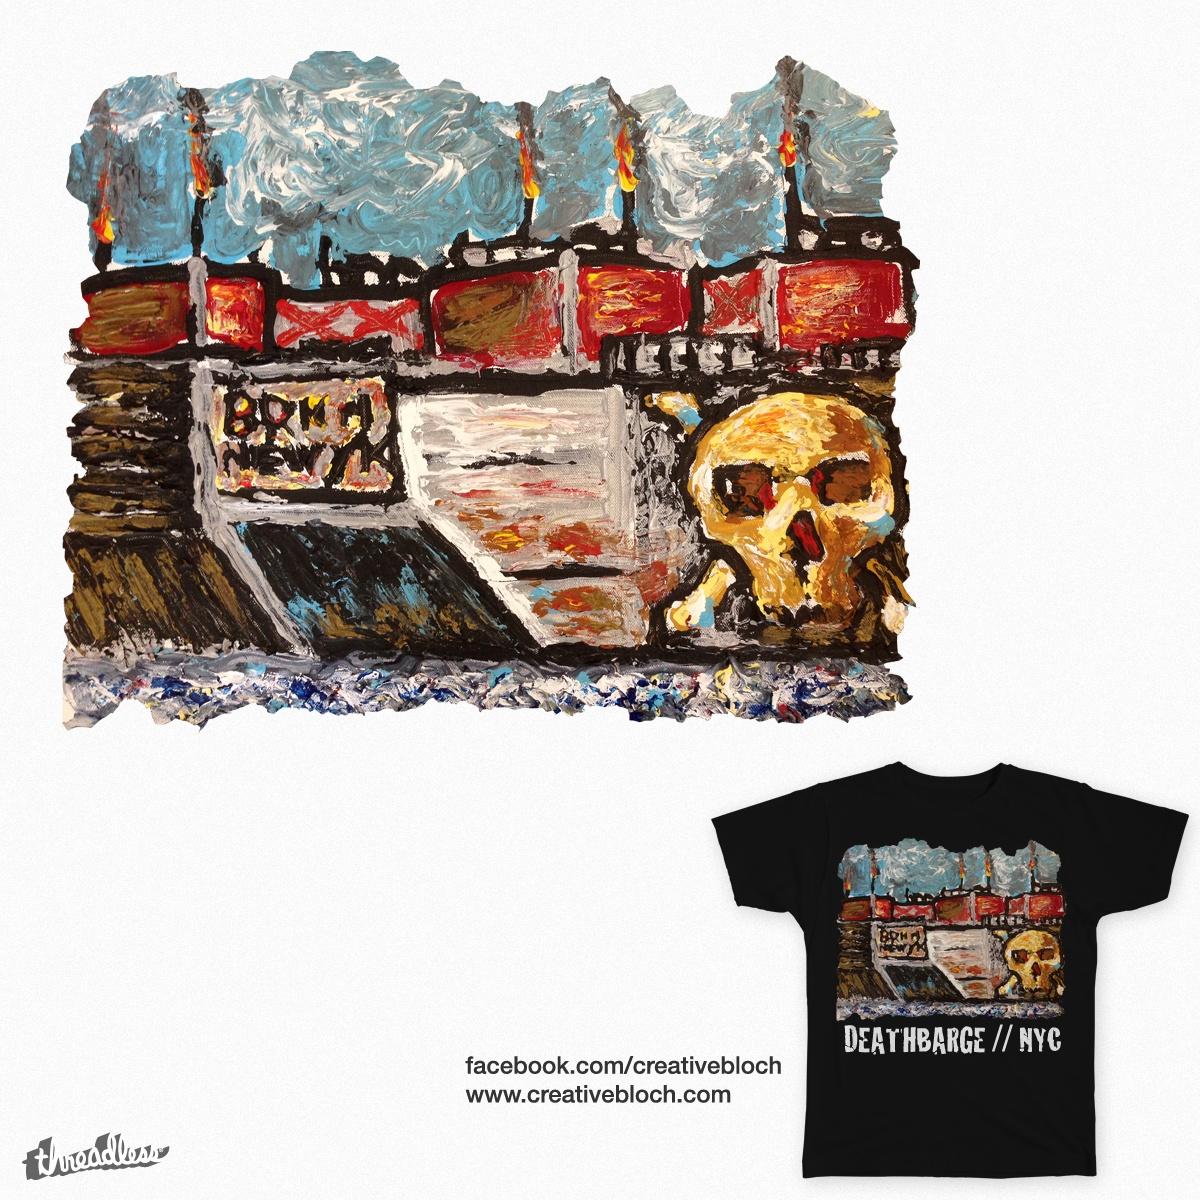 DEATHBARGE NYC by creativebloch on Threadless